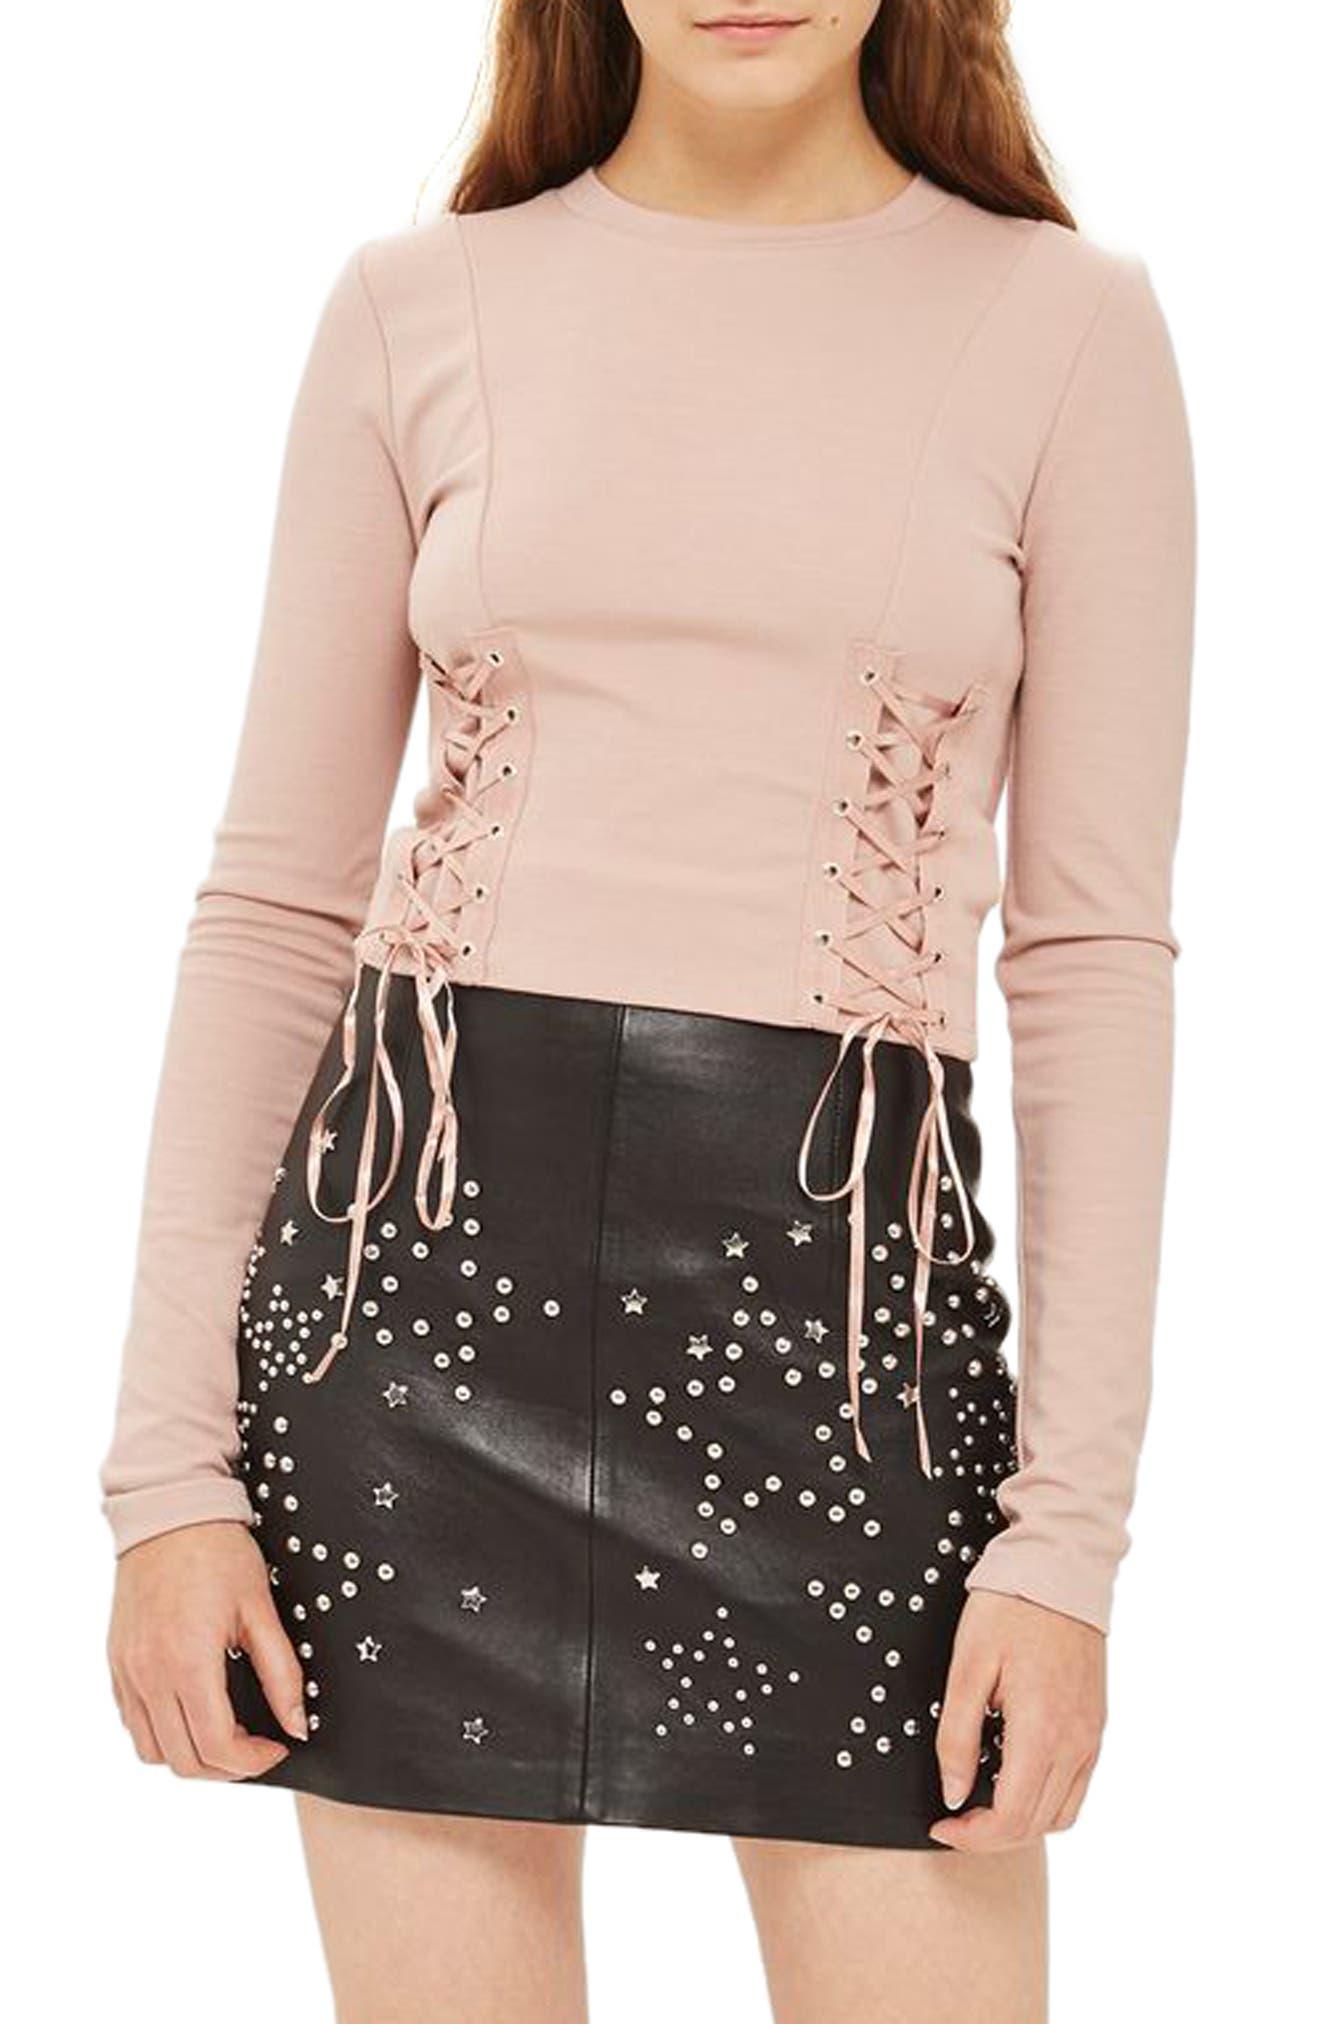 Main Image - Topshop Lace-Up Crop Top